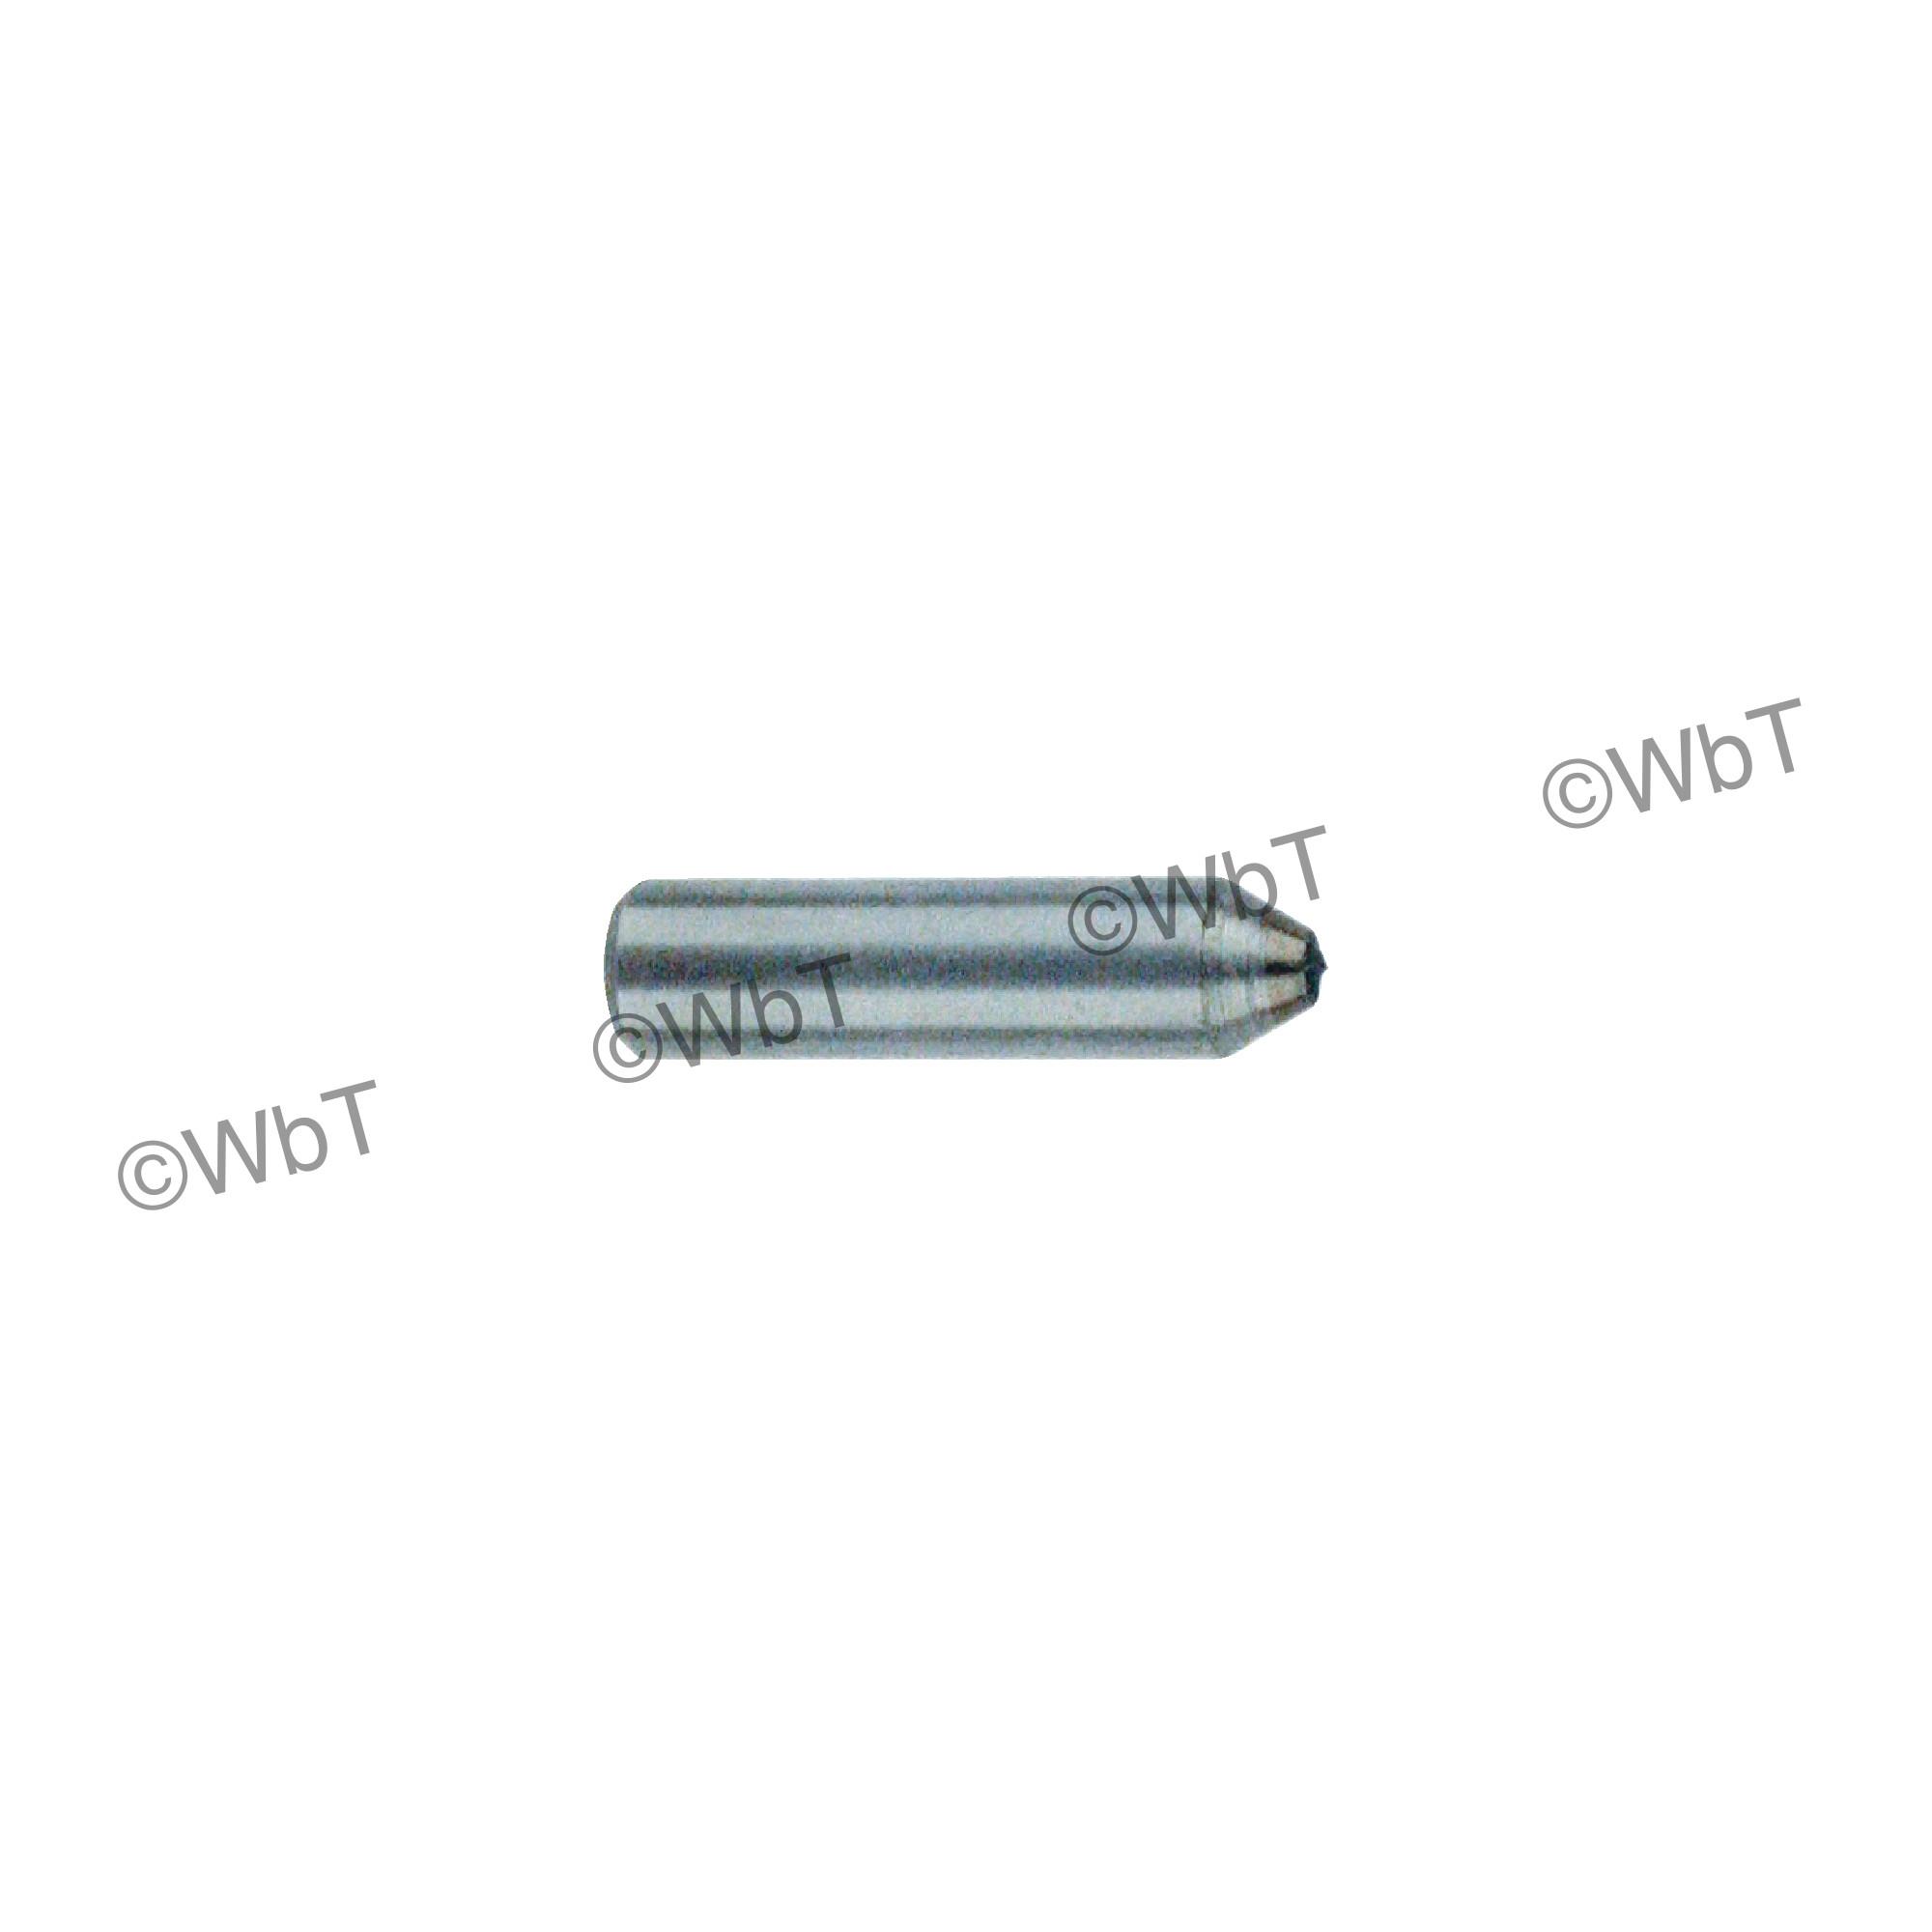 "TTC PRODUCTION Thread Grinding Diamond Tool - 3/8"" x 1-5/8"" Model: JL-3"